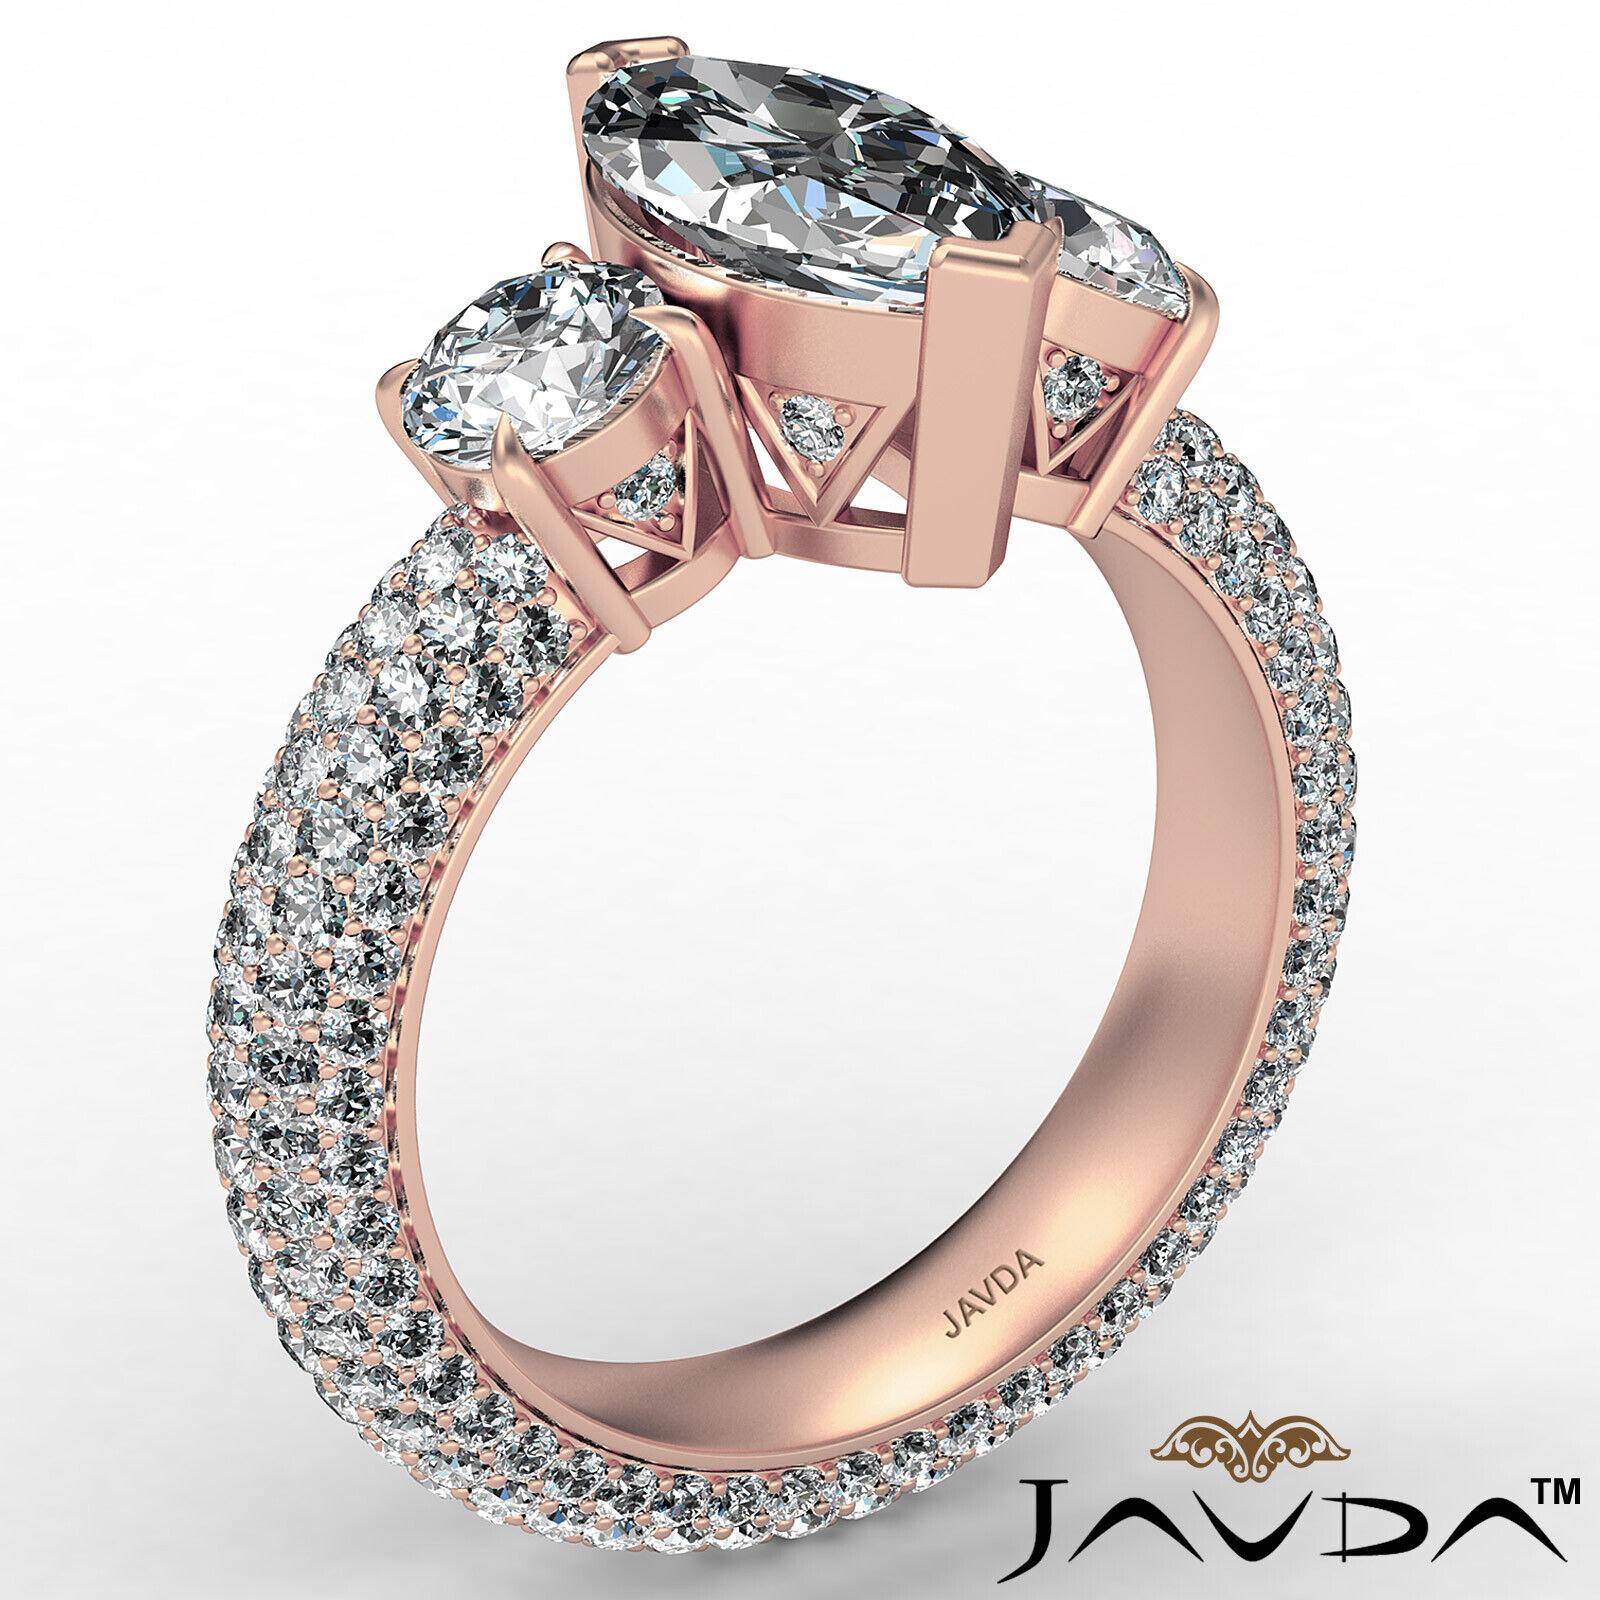 Marquise Diamond Engagement Pave Set Ring GIA K Color & VVS2 clarity 3.05 ctw 5